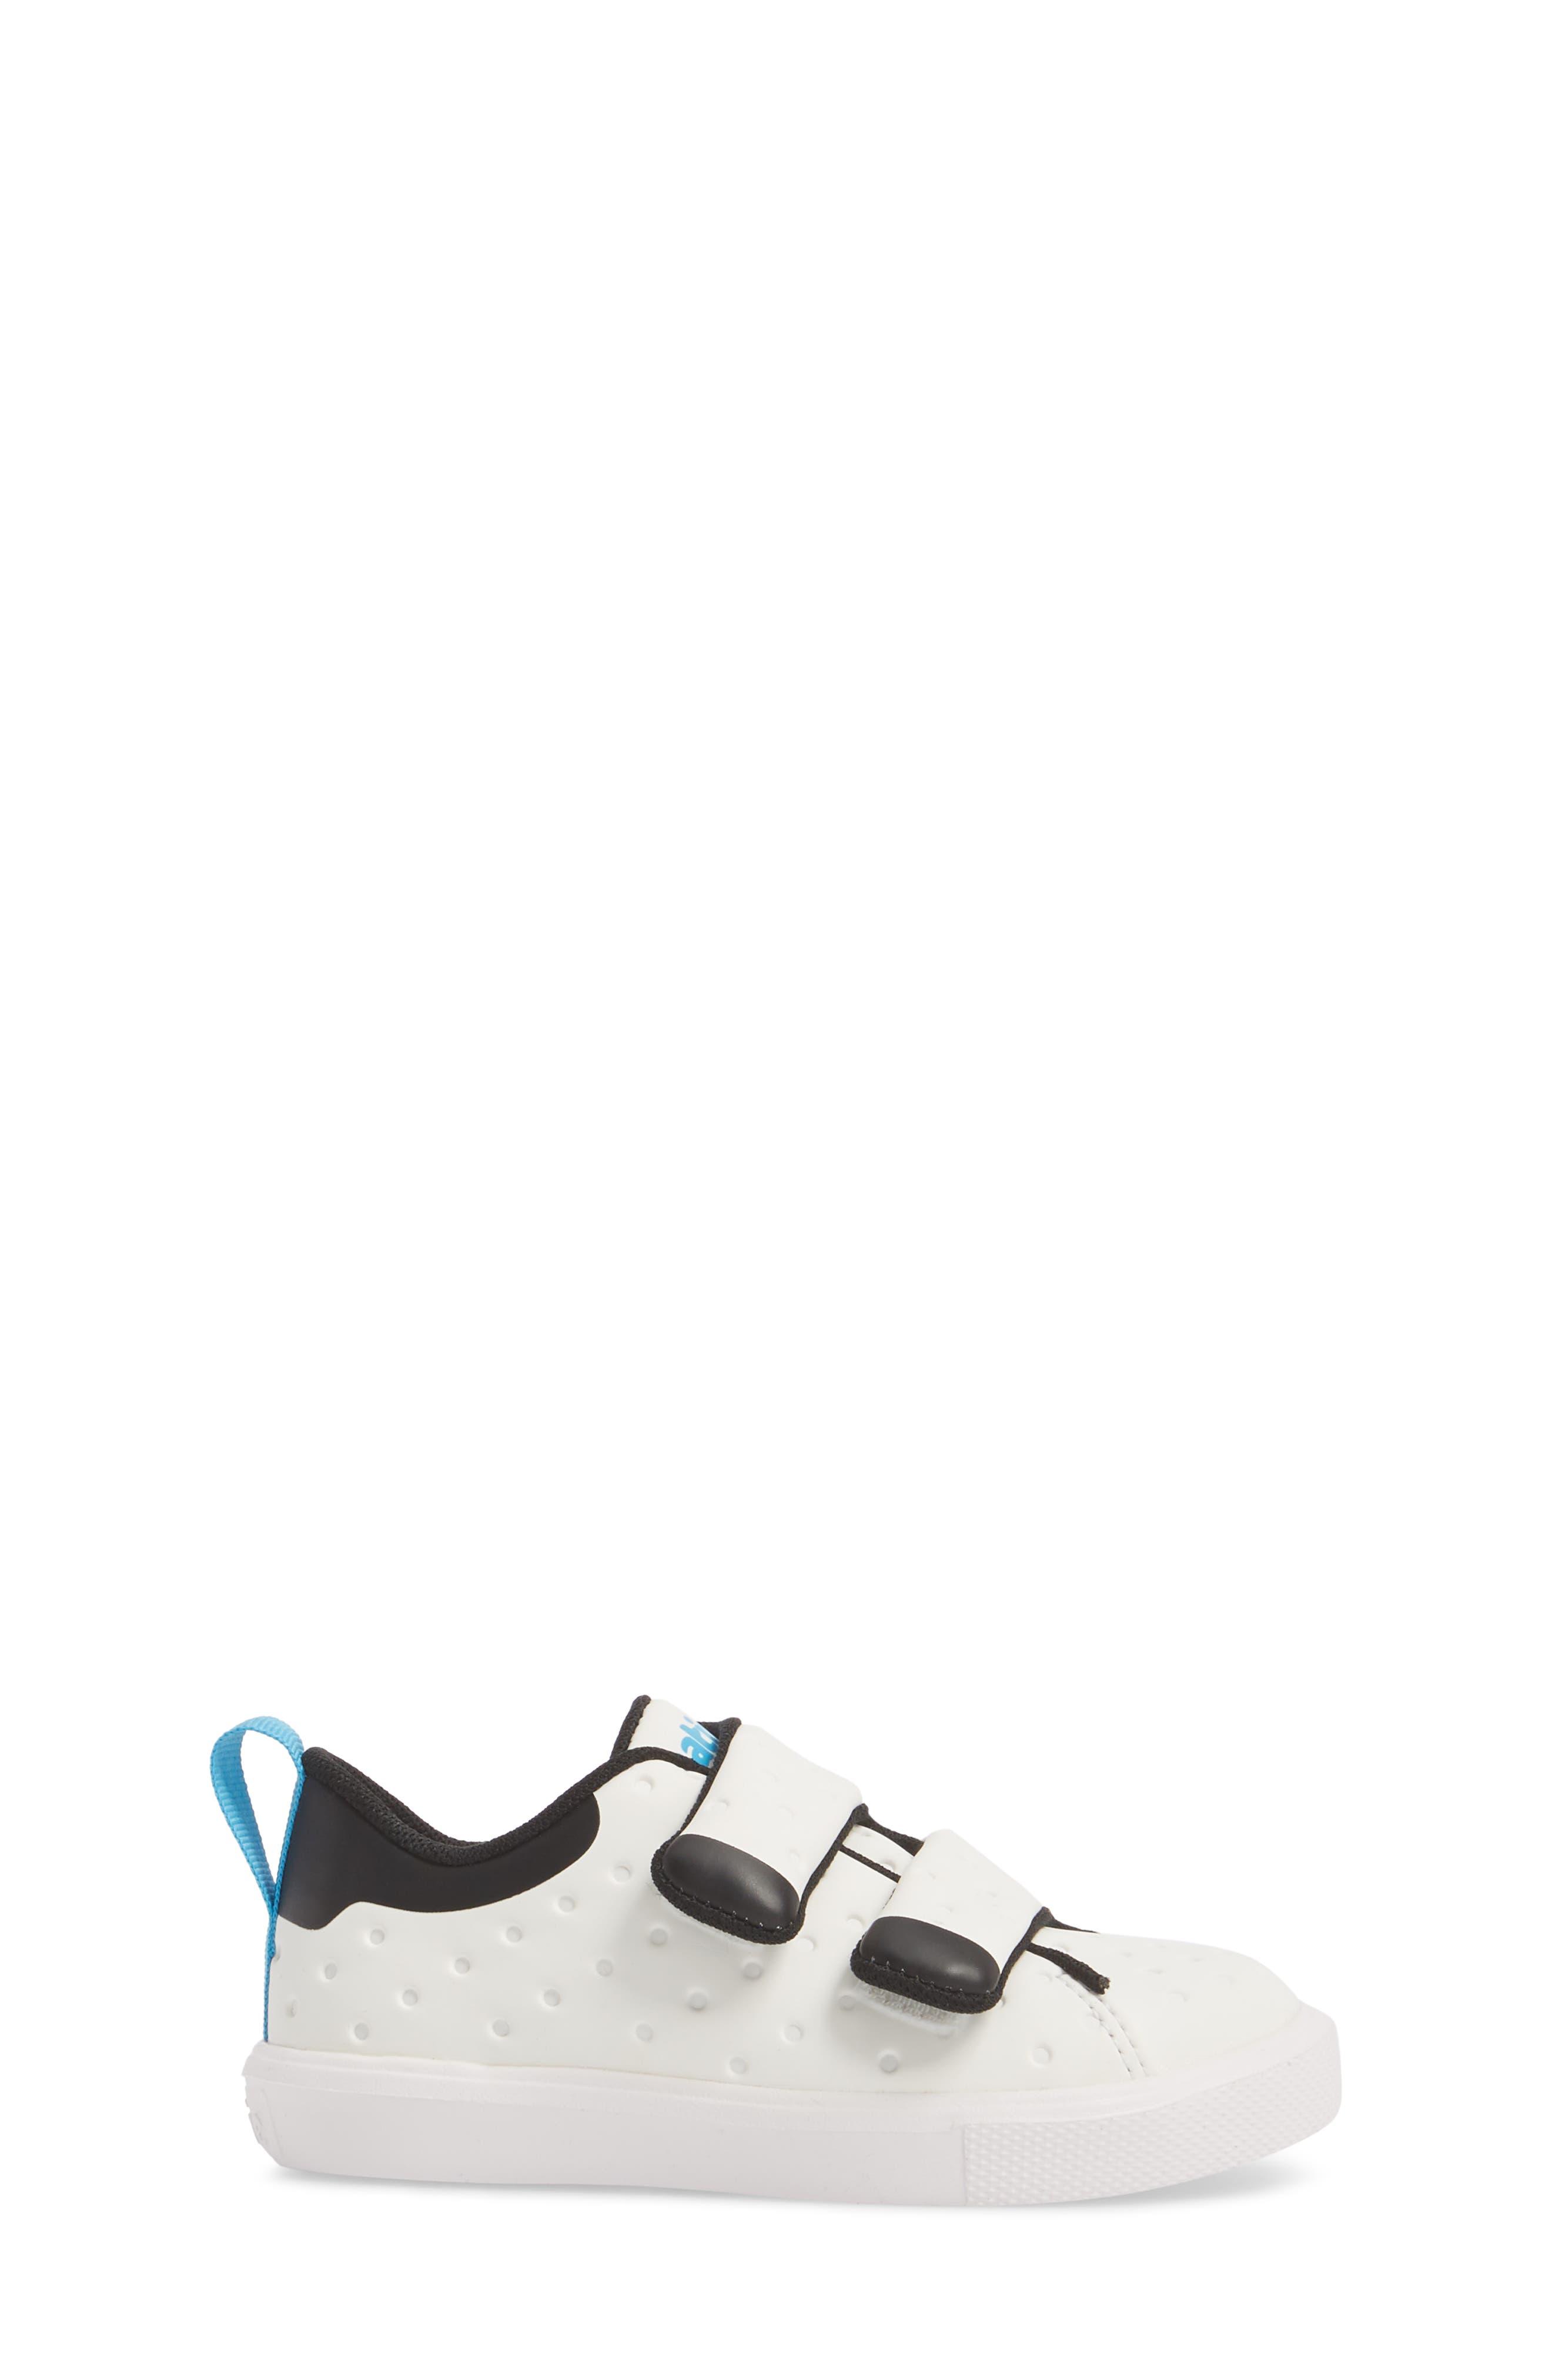 Monaco Sneaker,                             Alternate thumbnail 3, color,                             SHELL WHITE/ JIFFY BLACK